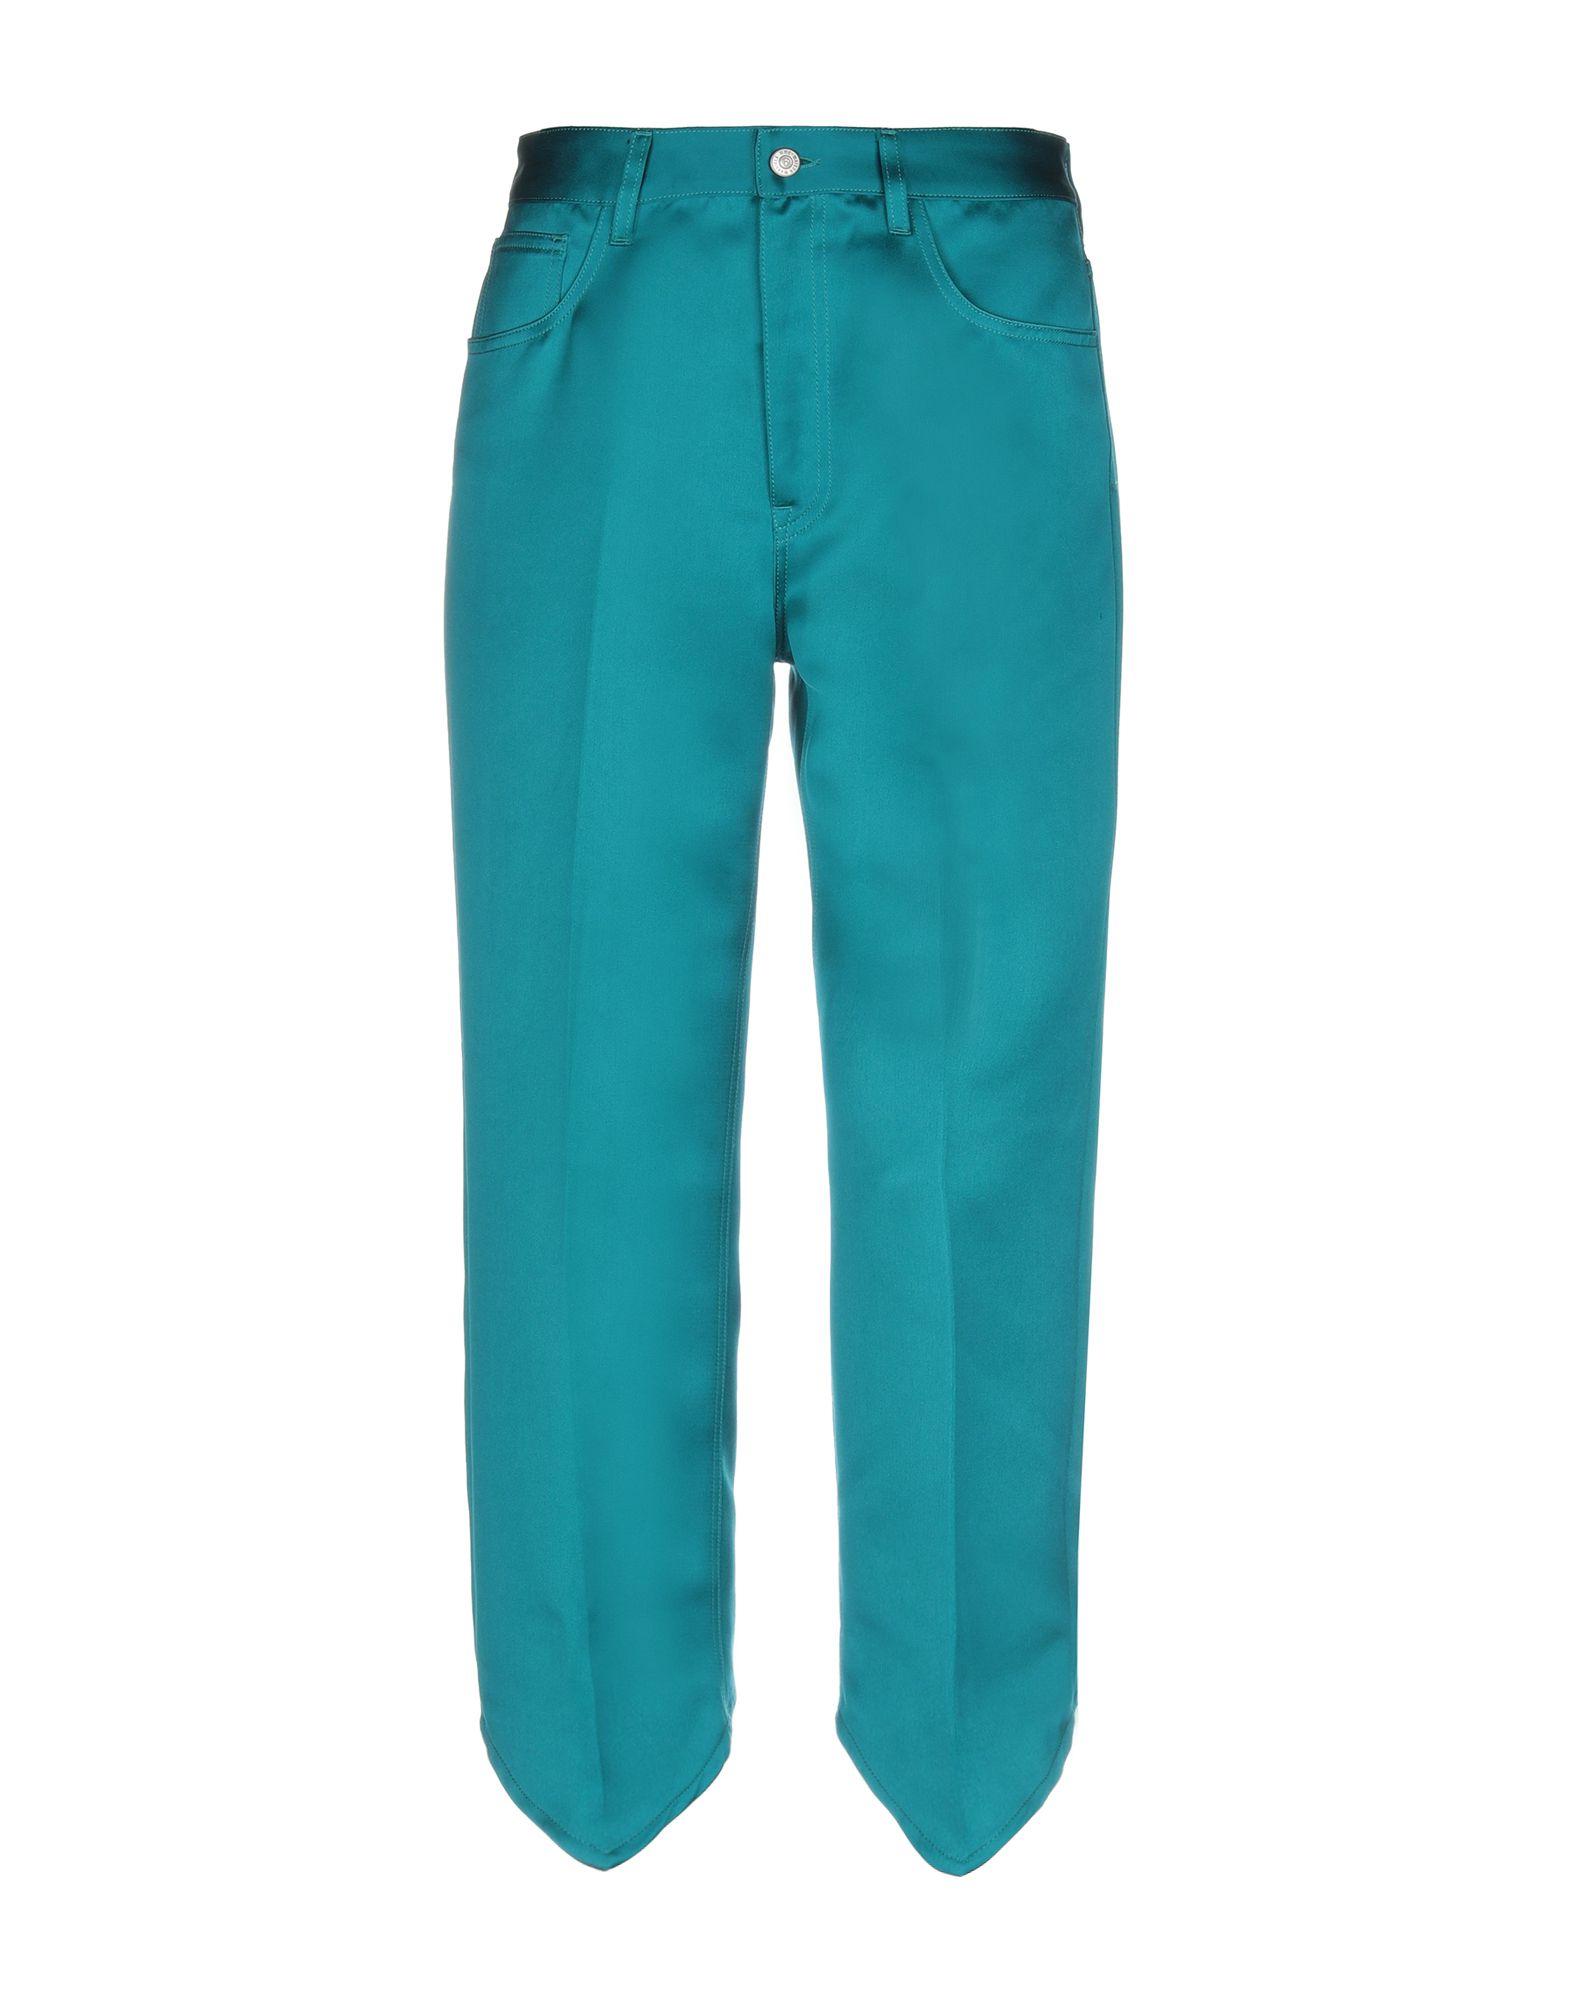 Pantalone Pantalone Mm6 Maison Margiela donna - 13238483XE  auf Lager